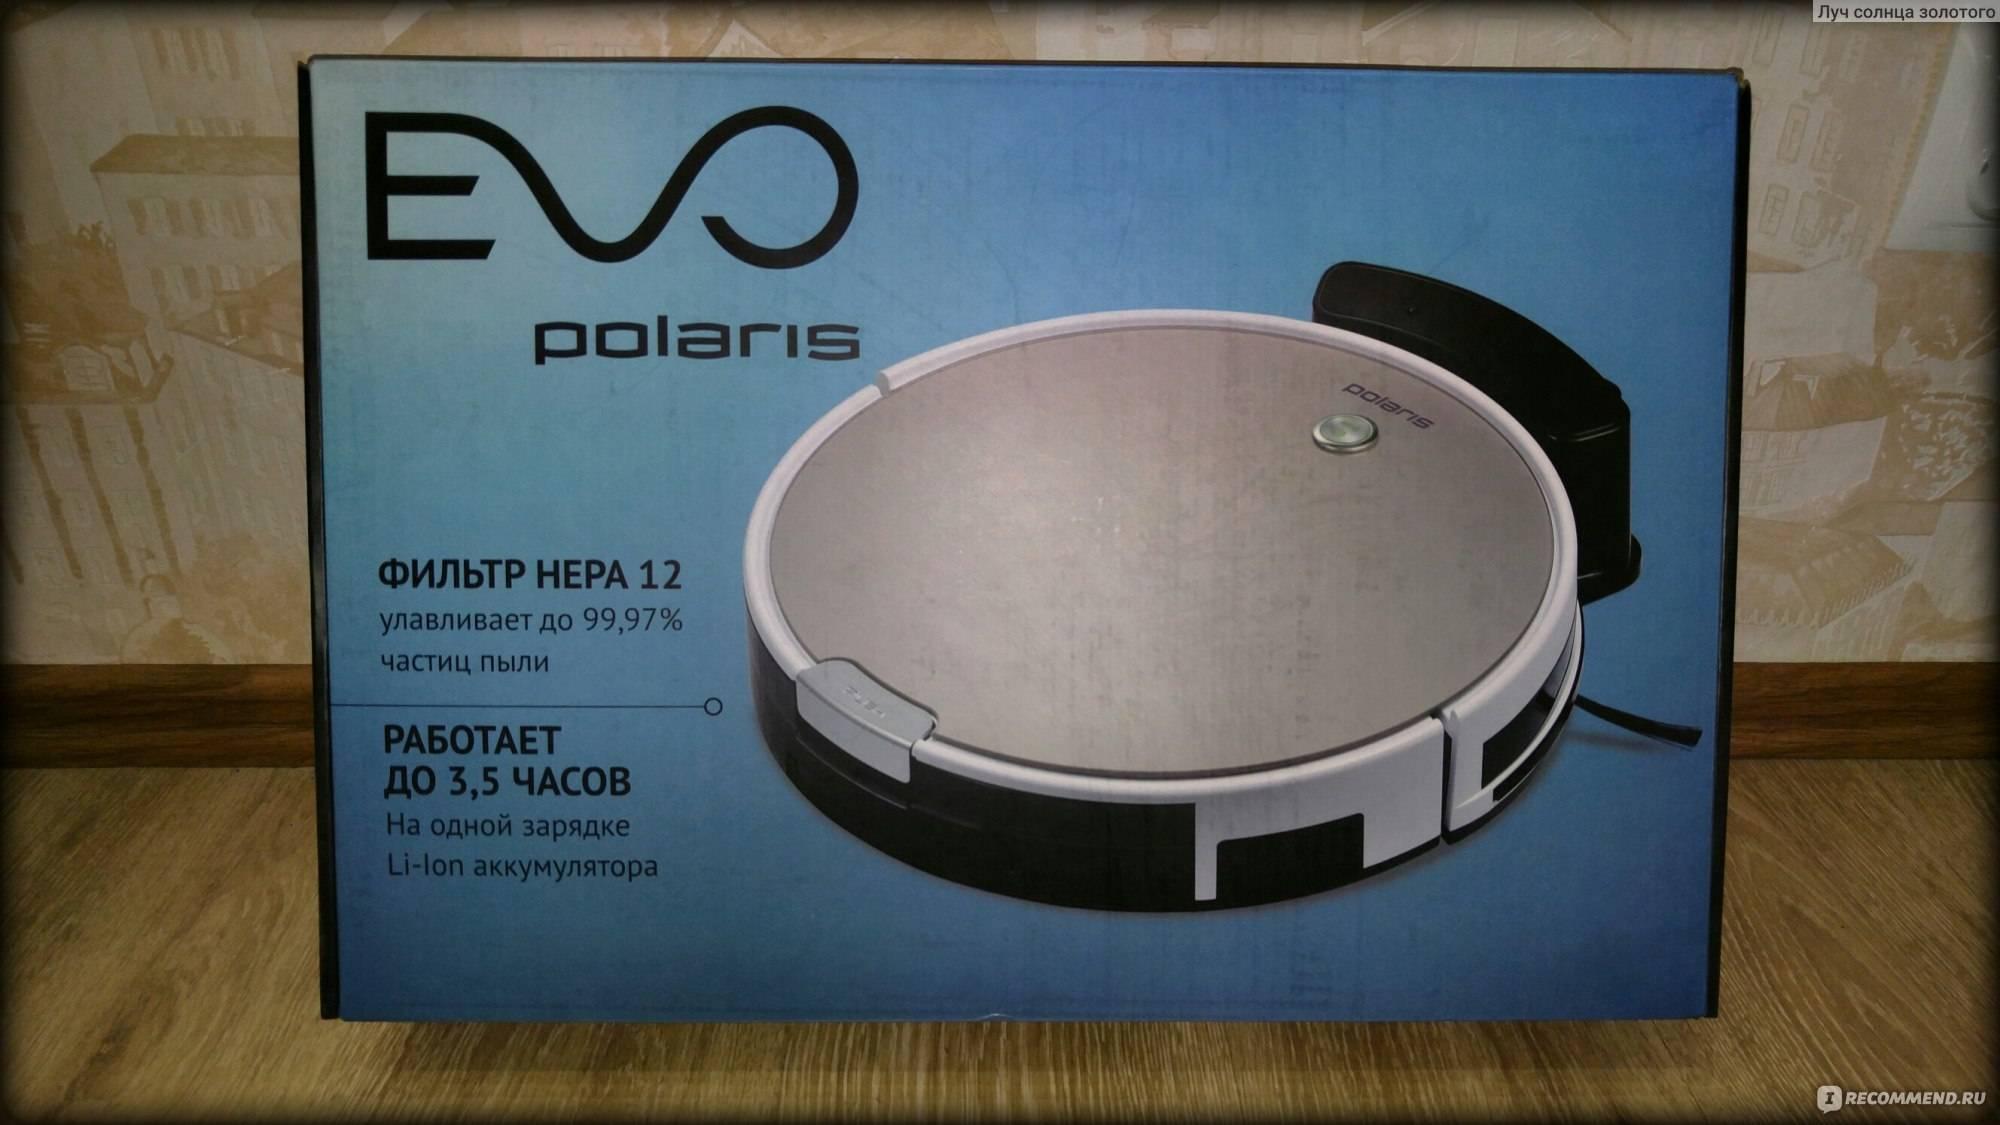 Polaris pvcr 0926w evo: обзор, характеристики, функции